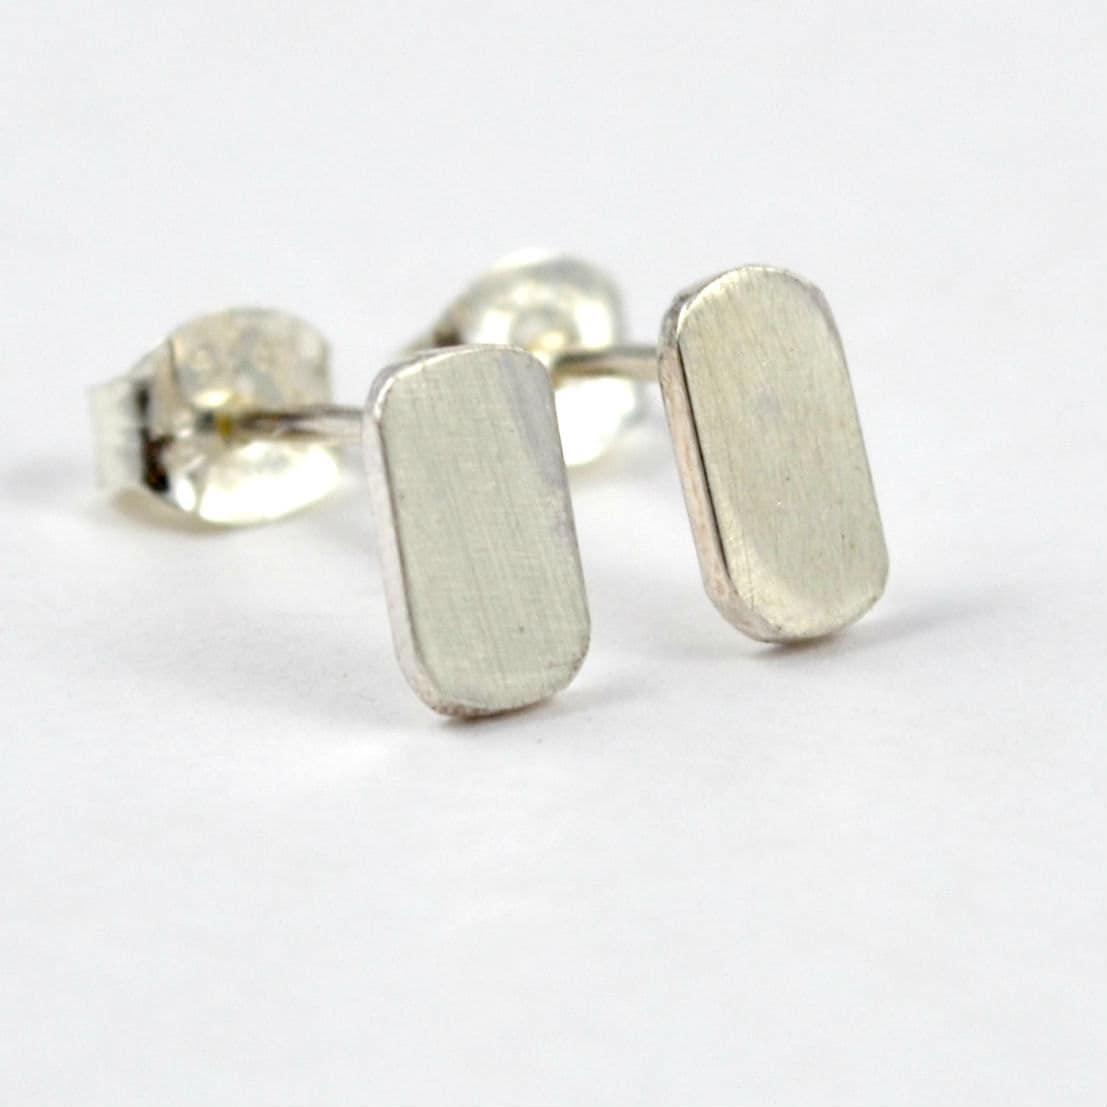 Flat Stud Earrings Sterling Silver Second Hole Earrings. Designer Bracelet. Pink Rose Watches. Dream Bracelet. 1 Carat Center Stone Engagement Rings. Platinum Band Wedding Ring. Rose Rings. Multi Diamond Bands. Block Diamond